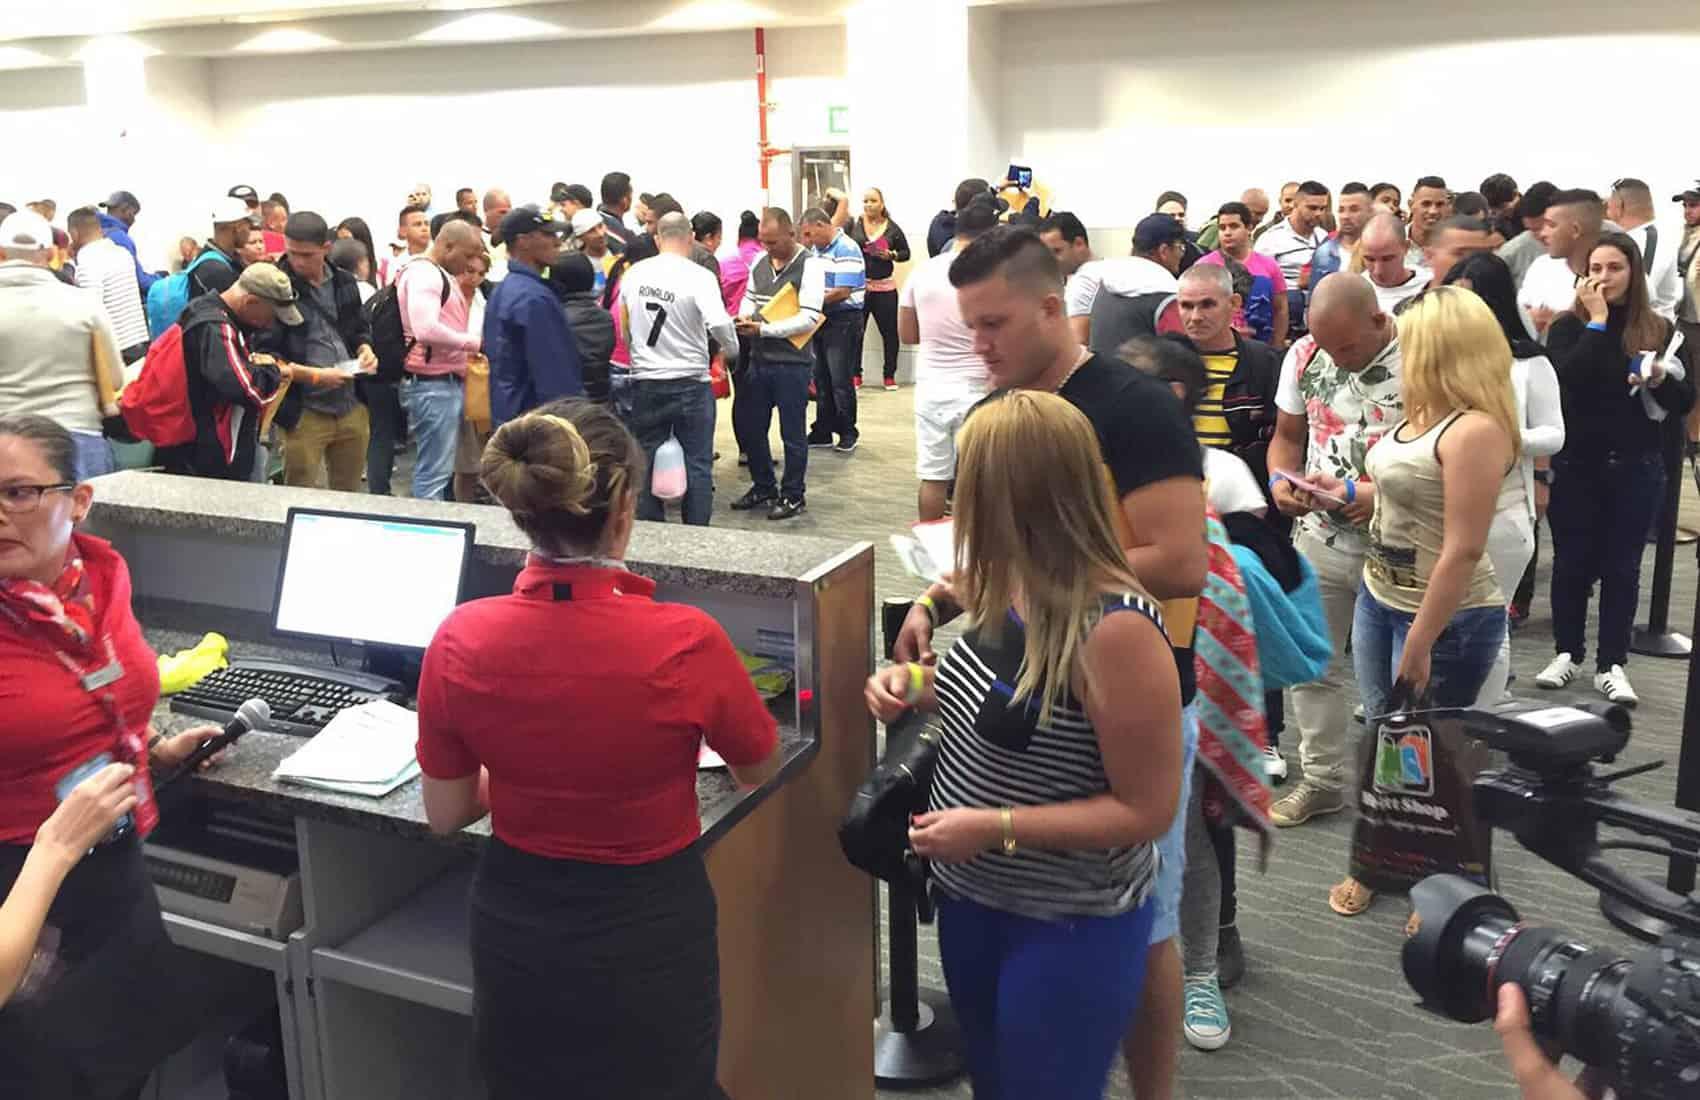 Cuban migrants at Daniel Oduber International Airport in LIberia